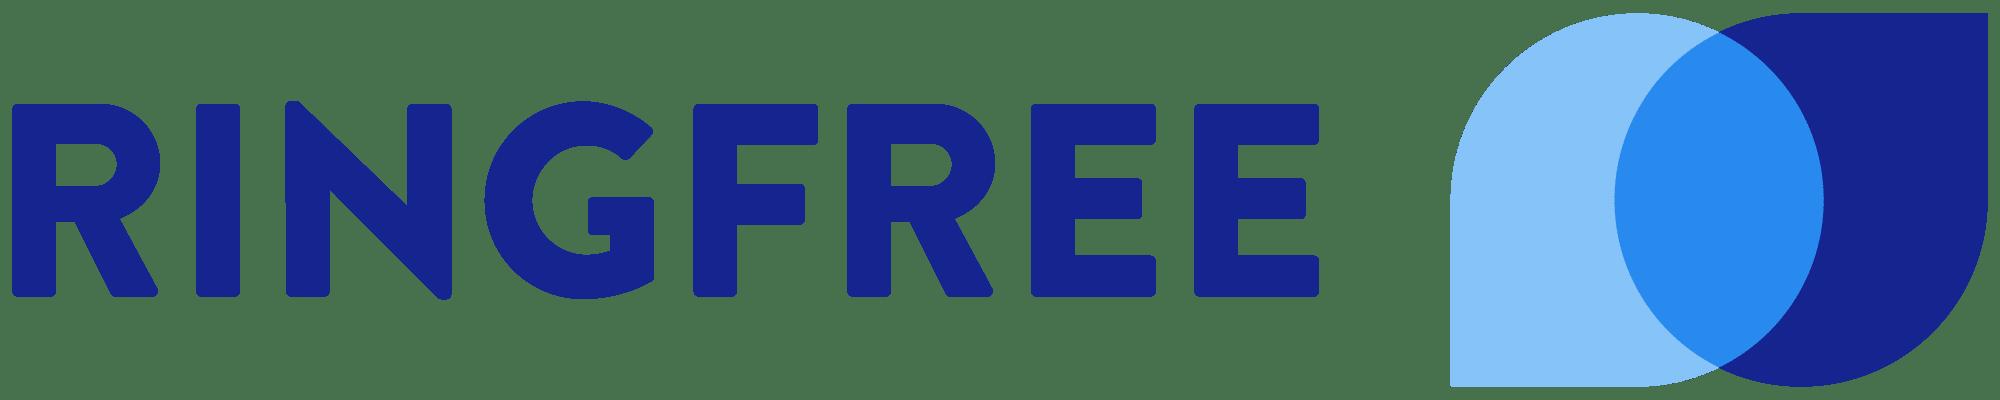 Ringfree logo